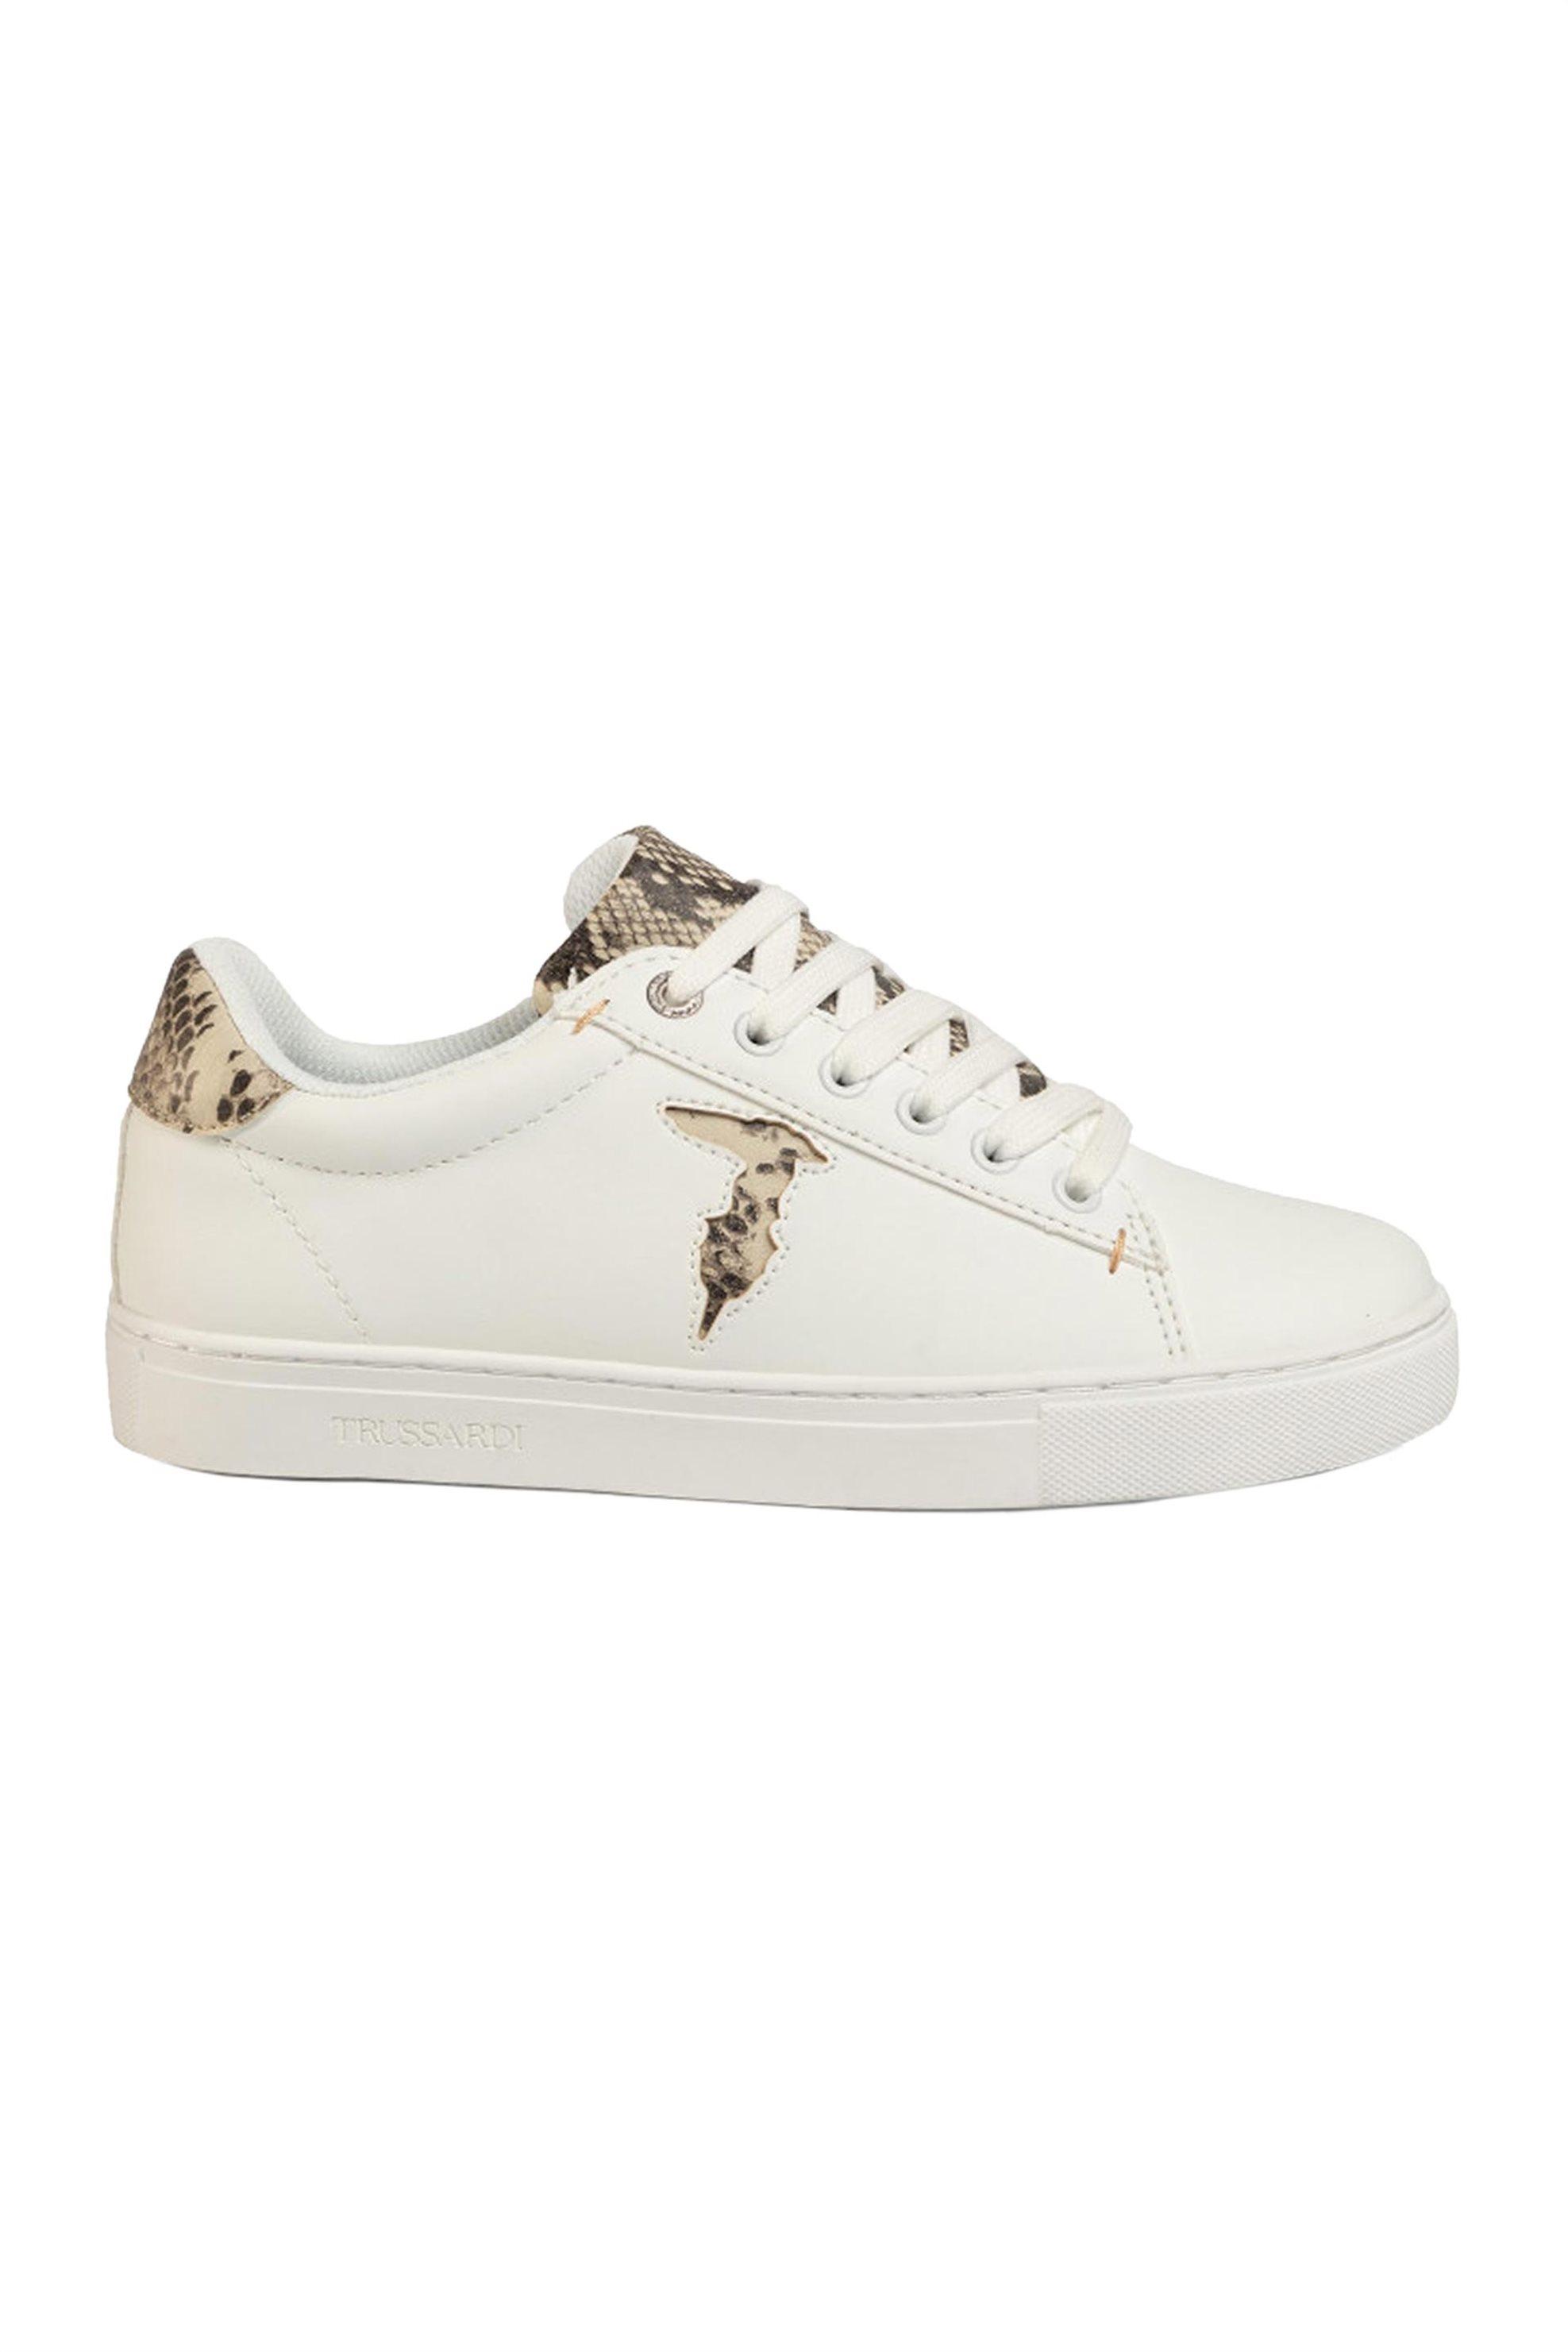 Trussardi γυναικεία sneakers με snake print – 79A00527-9Y099999 – Καφέ